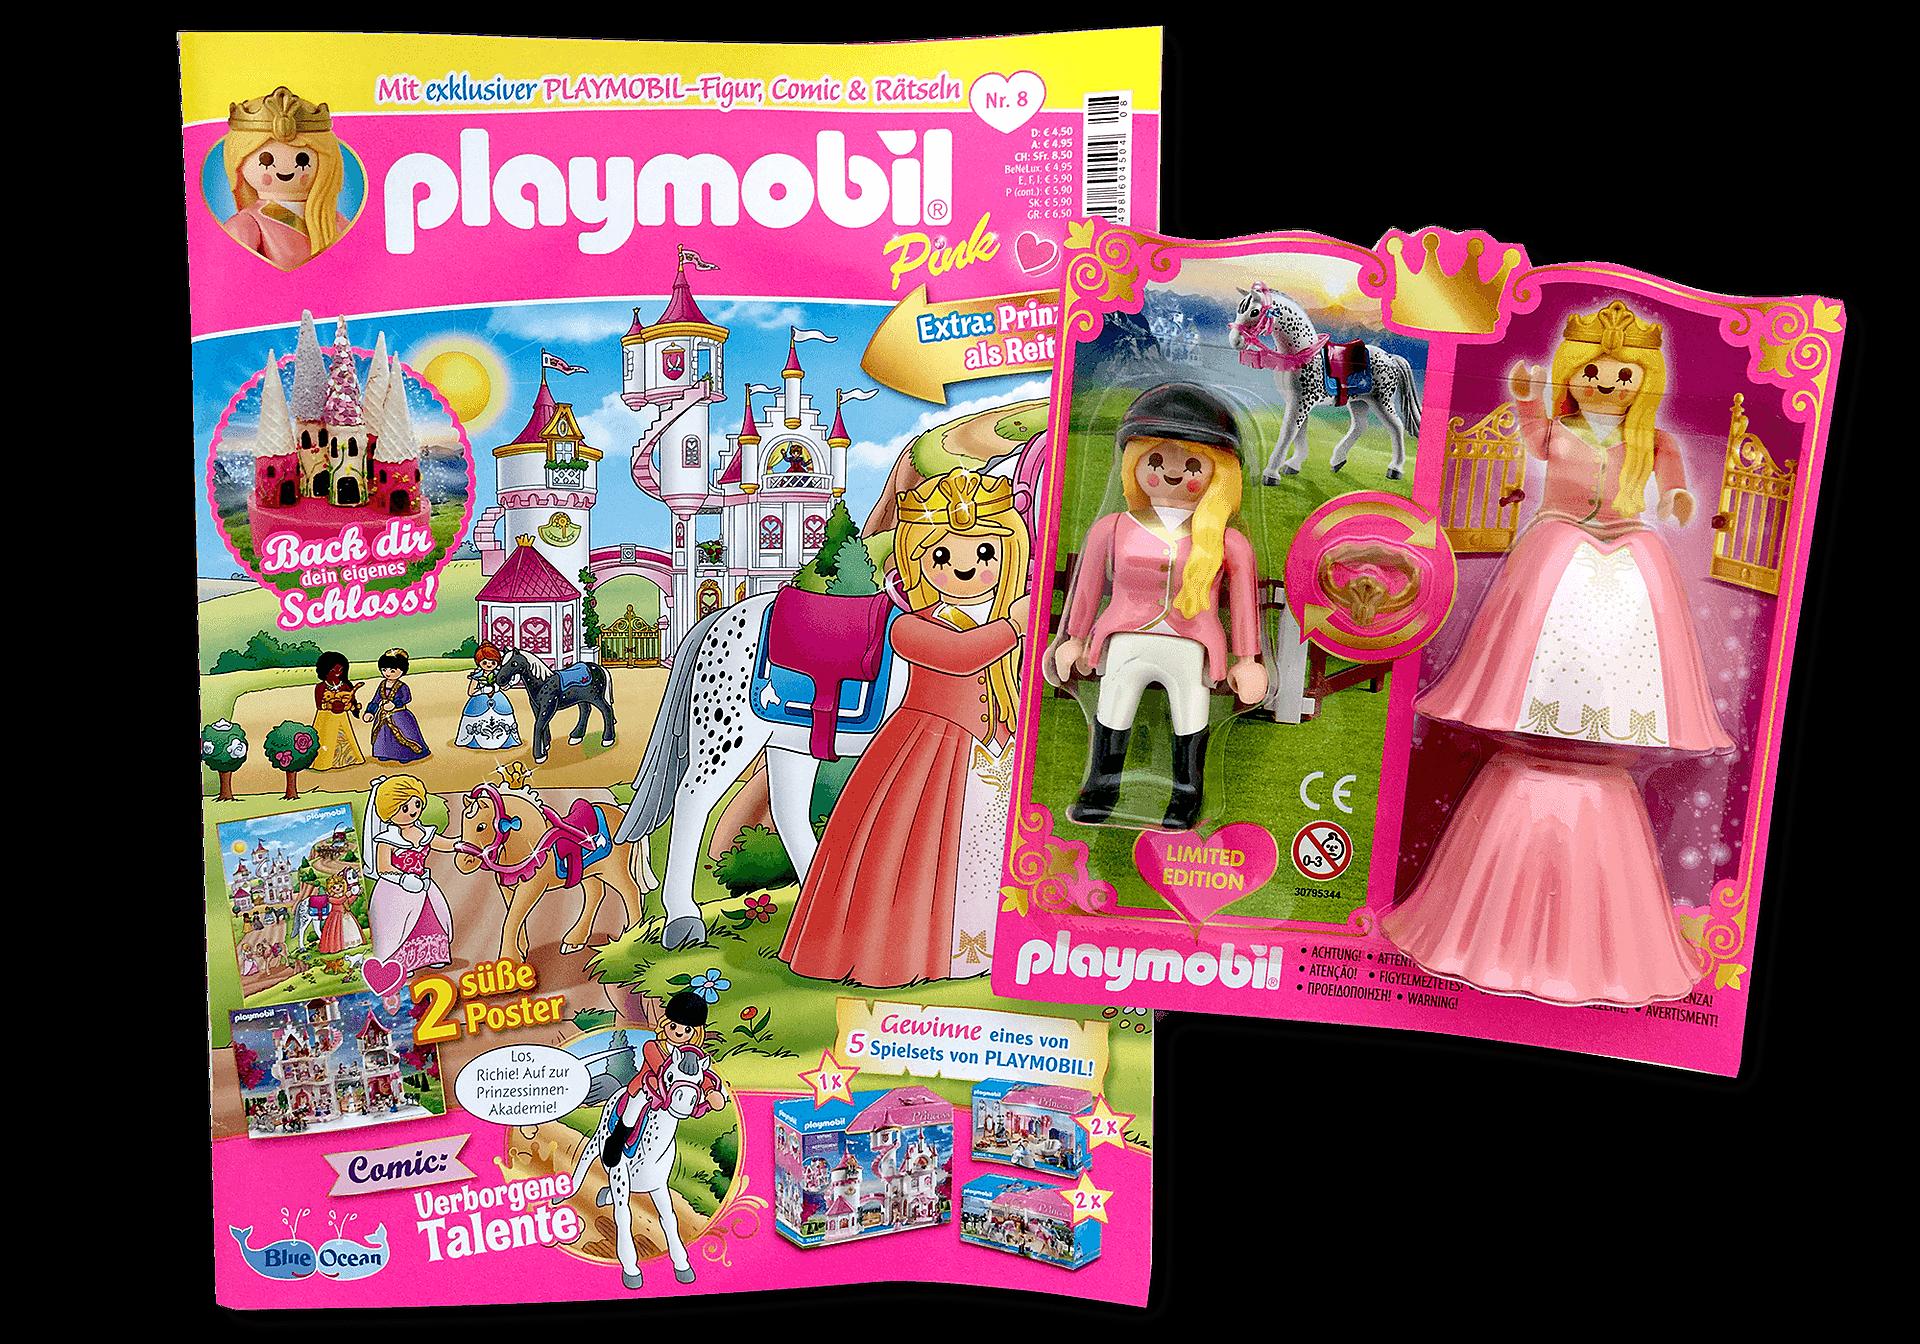 80670 PLAYMOBIL-Magazin Pink 8/2020 (Heft 57) zoom image1